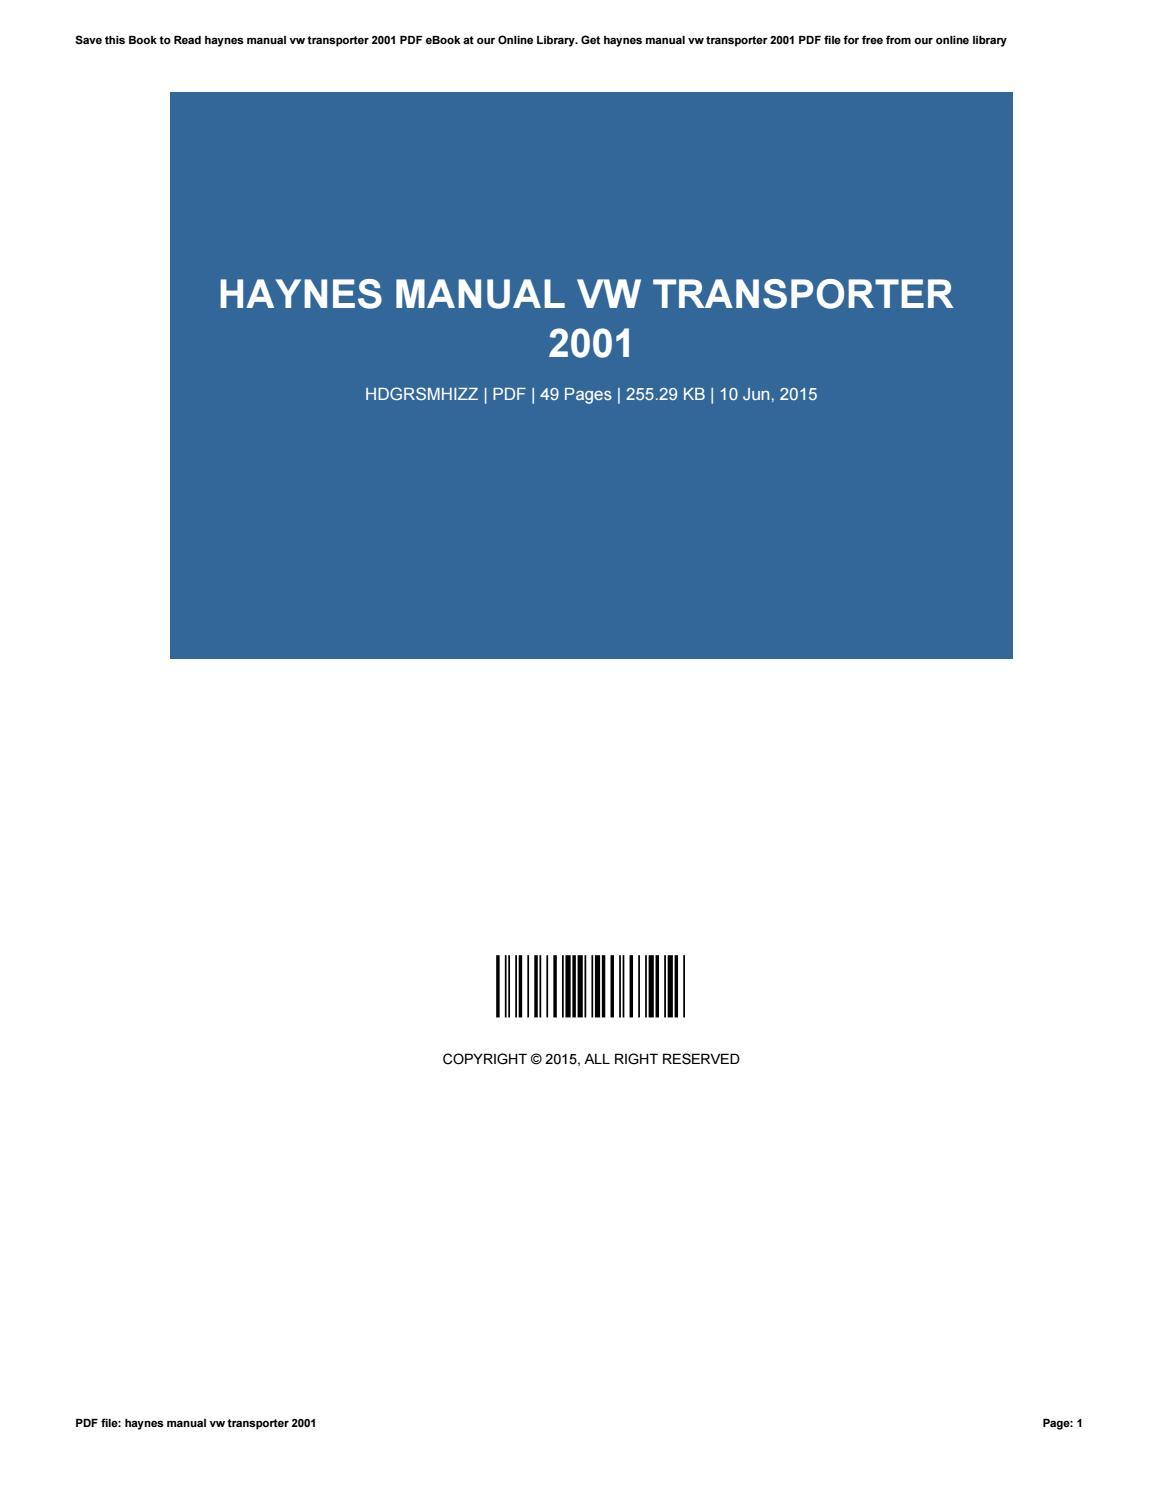 haynes manual online free pdf